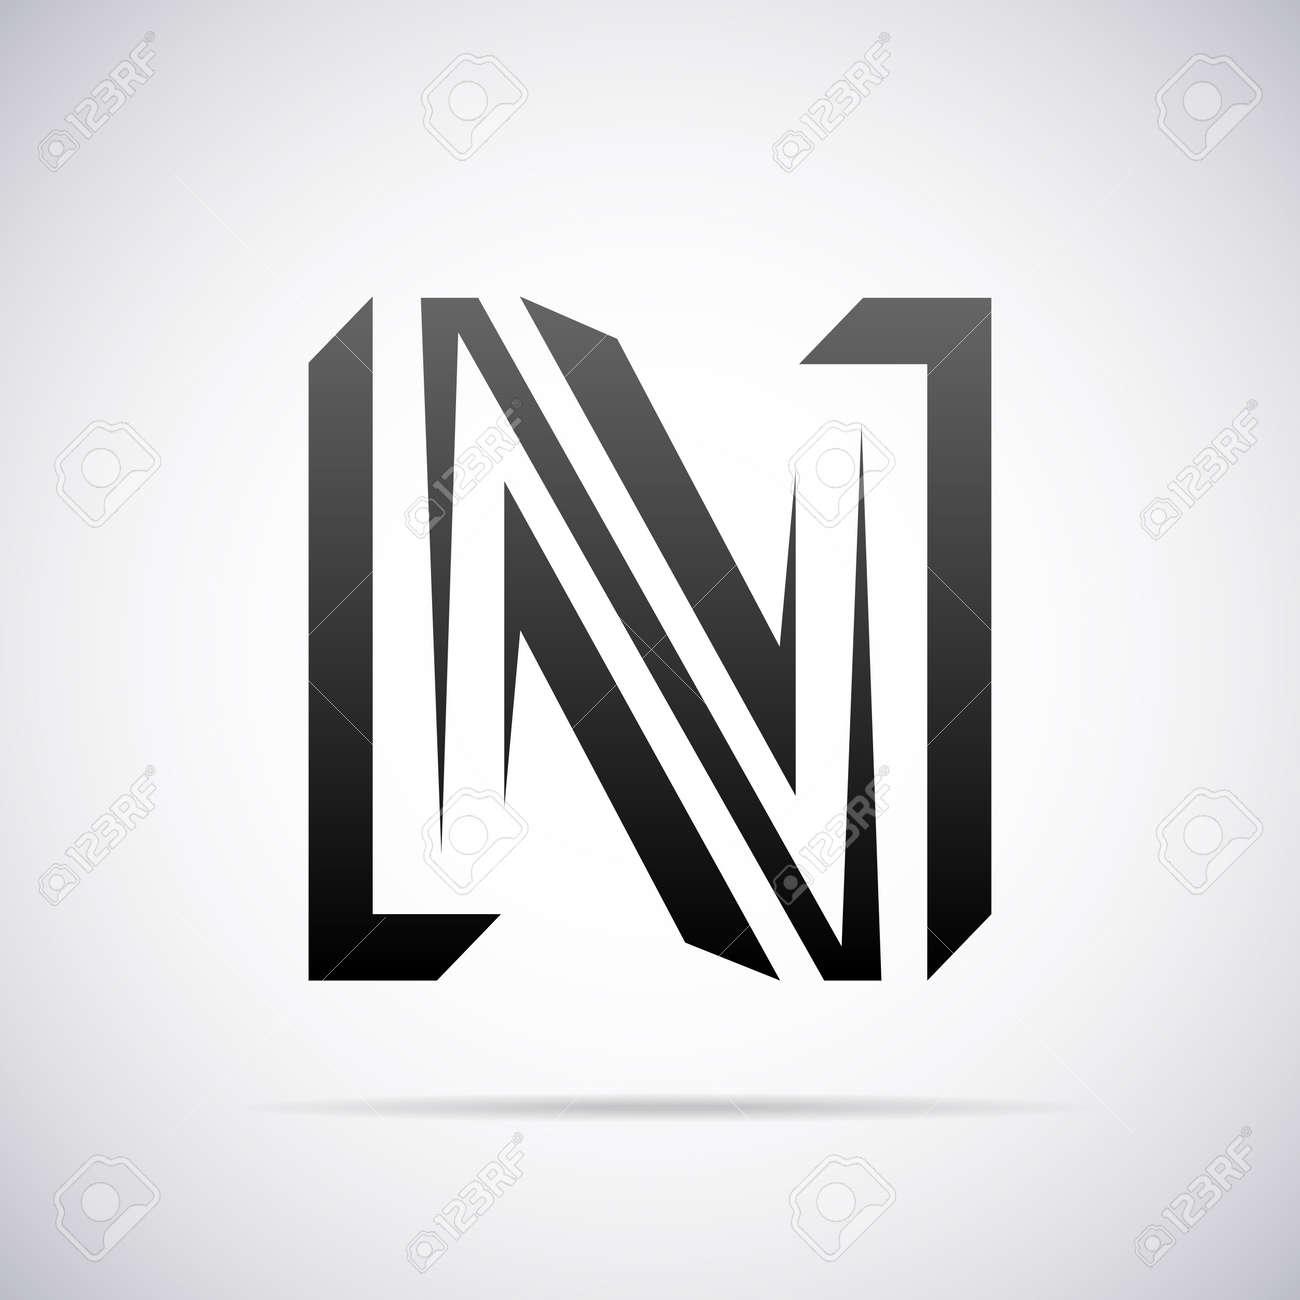 Logo For Letter N Design Template Vector Illustration Royalty Free